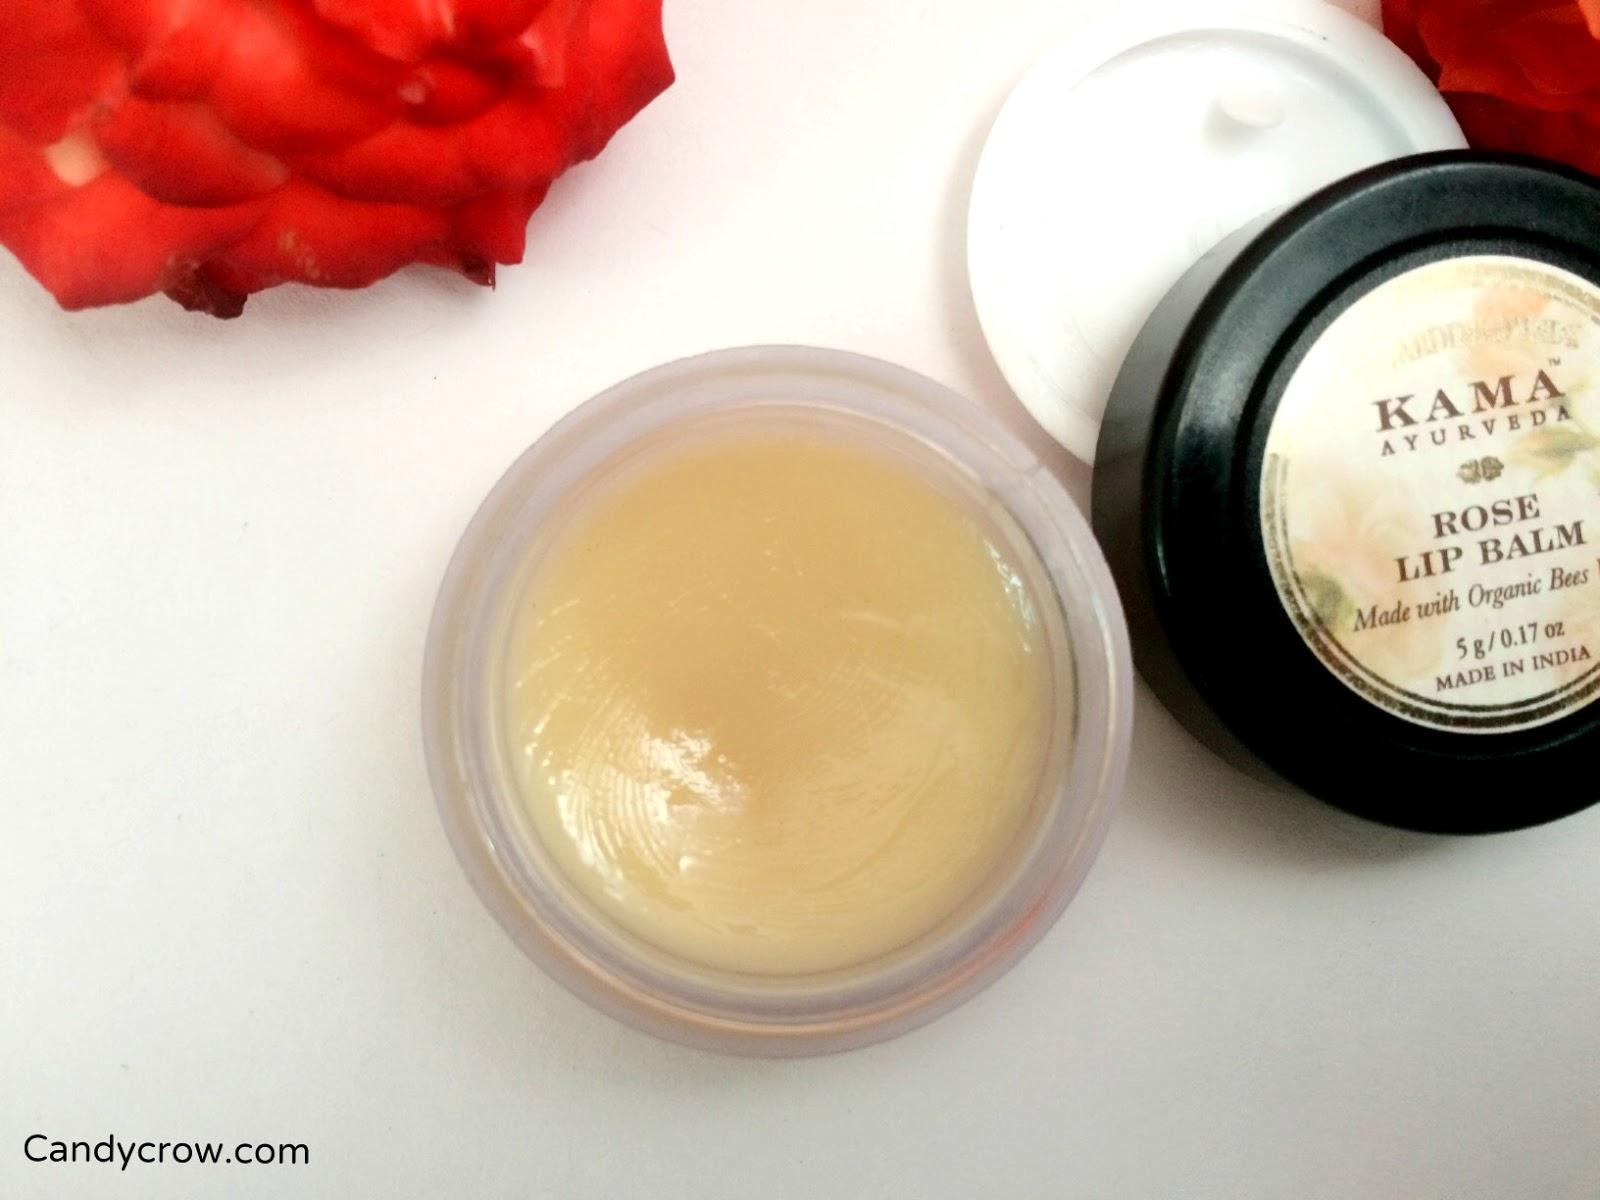 Kama Ayurveda Rose Lip Balm, 5g Skin Ceuticals - Daily Moisture (For Normal or Oily Skin) -60ml/2oz